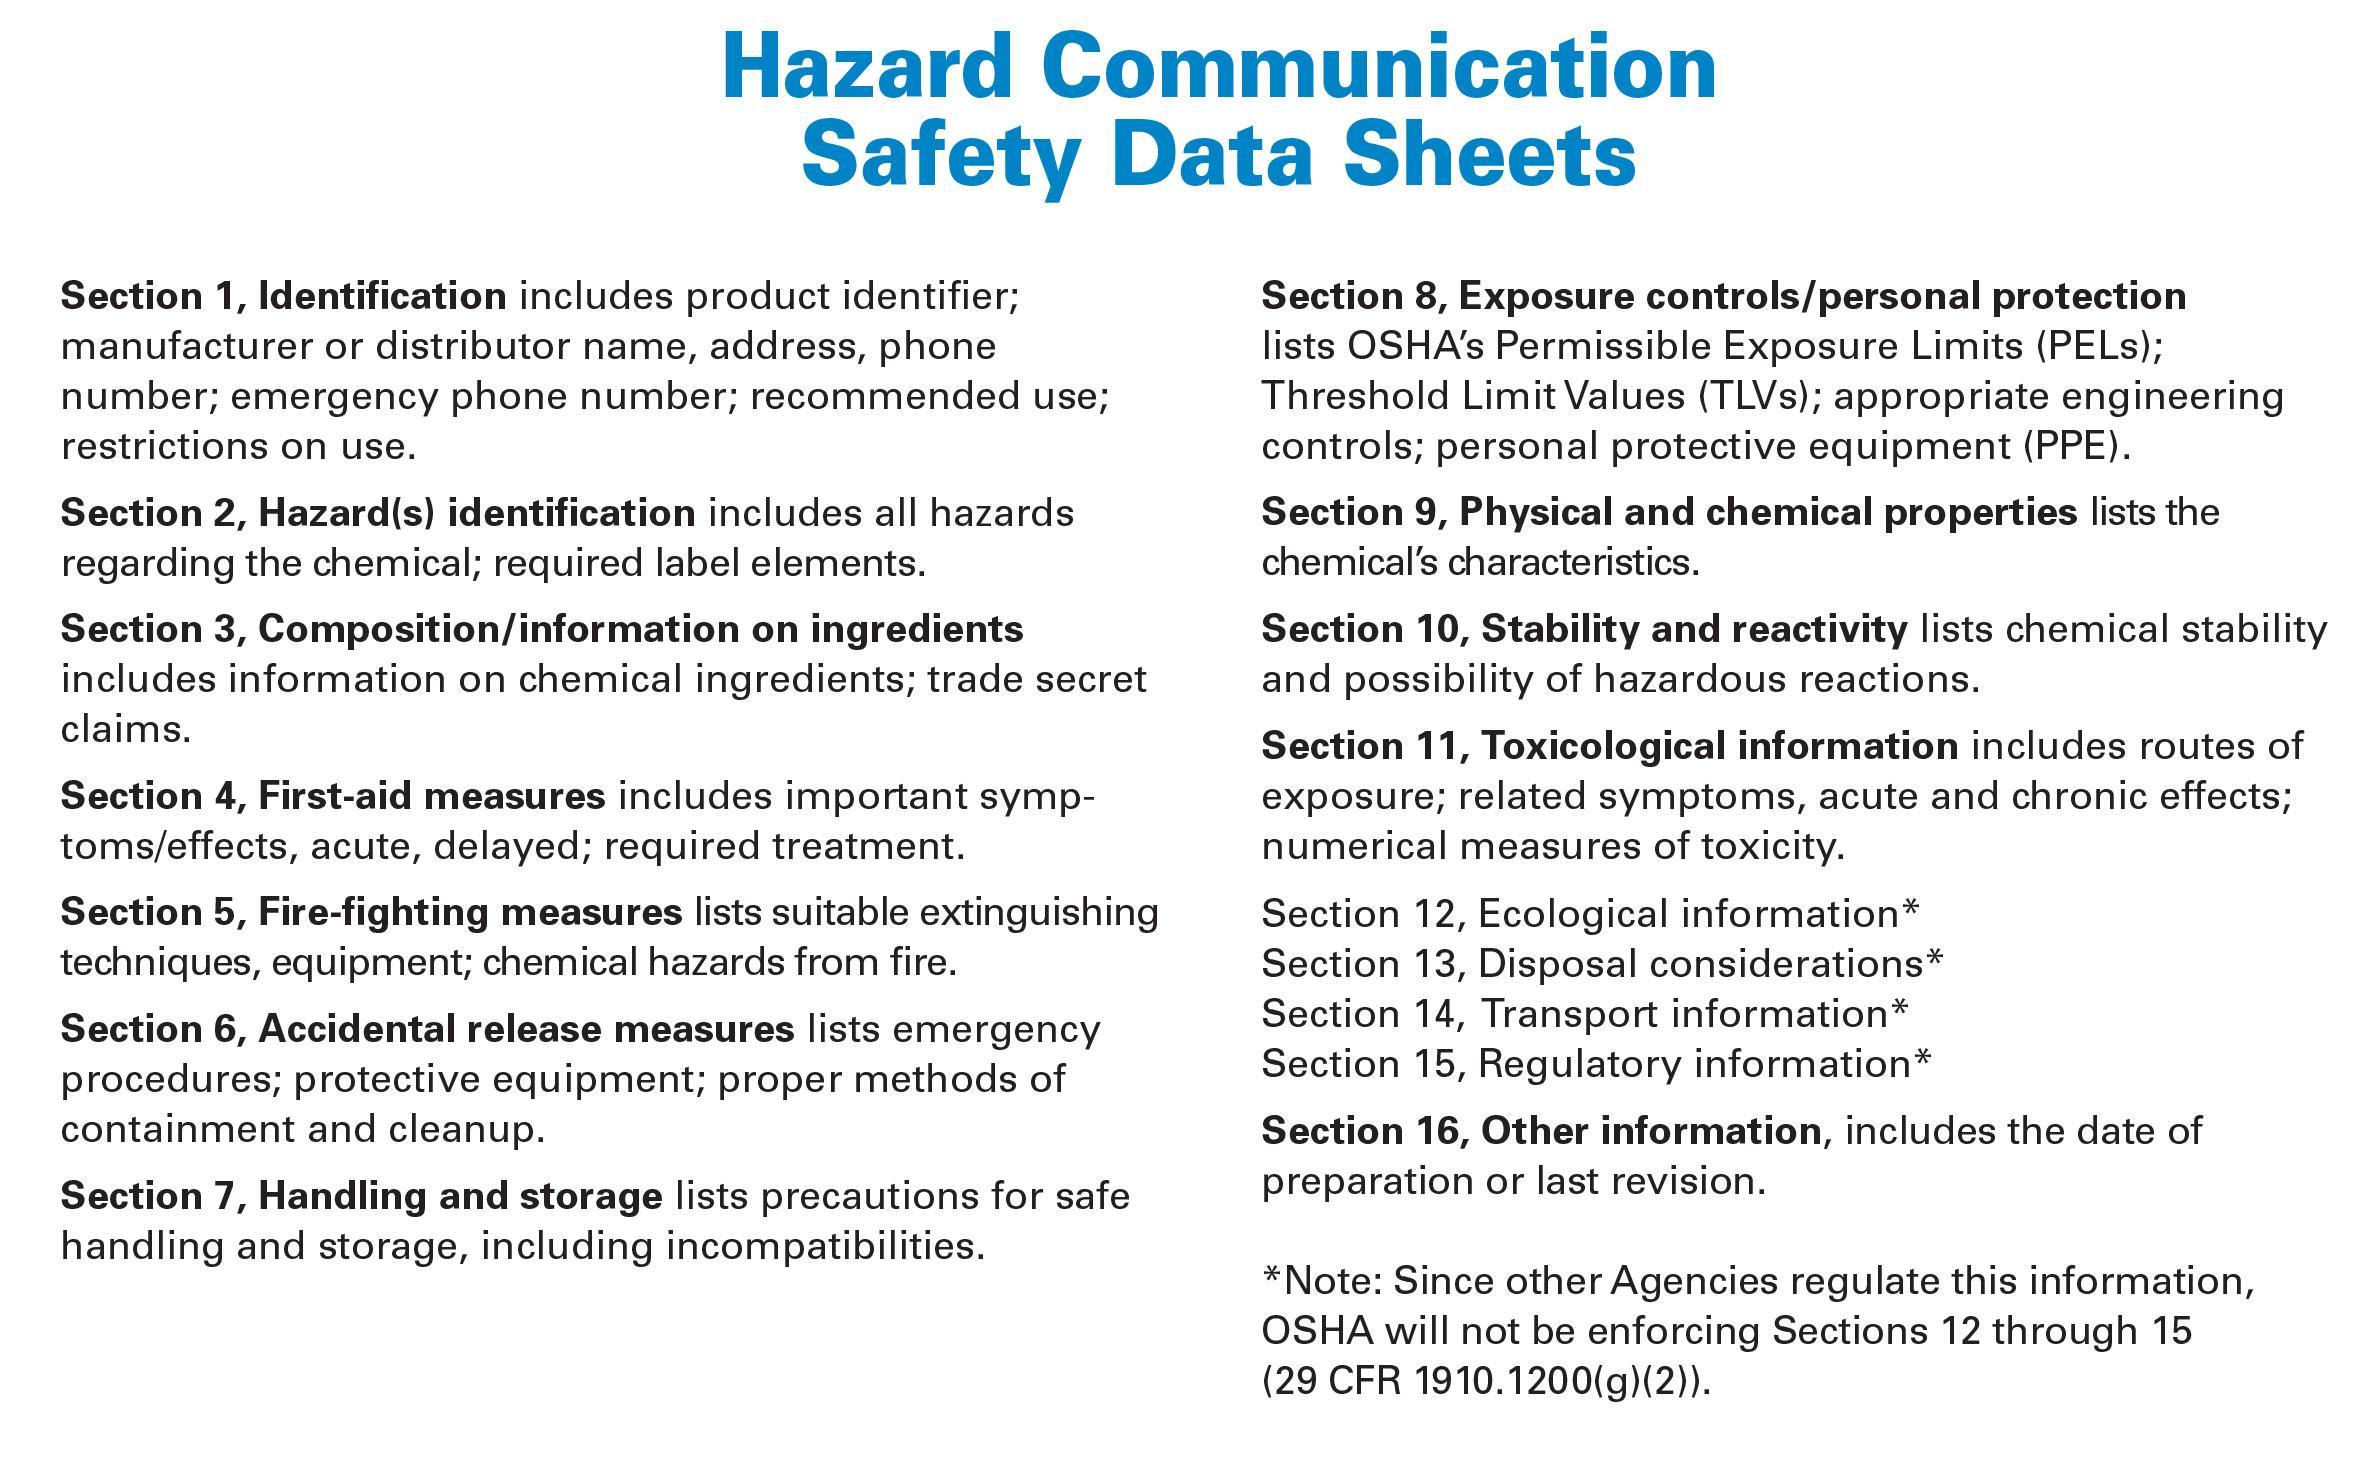 2016 Osha's Hazard Communication Program Template